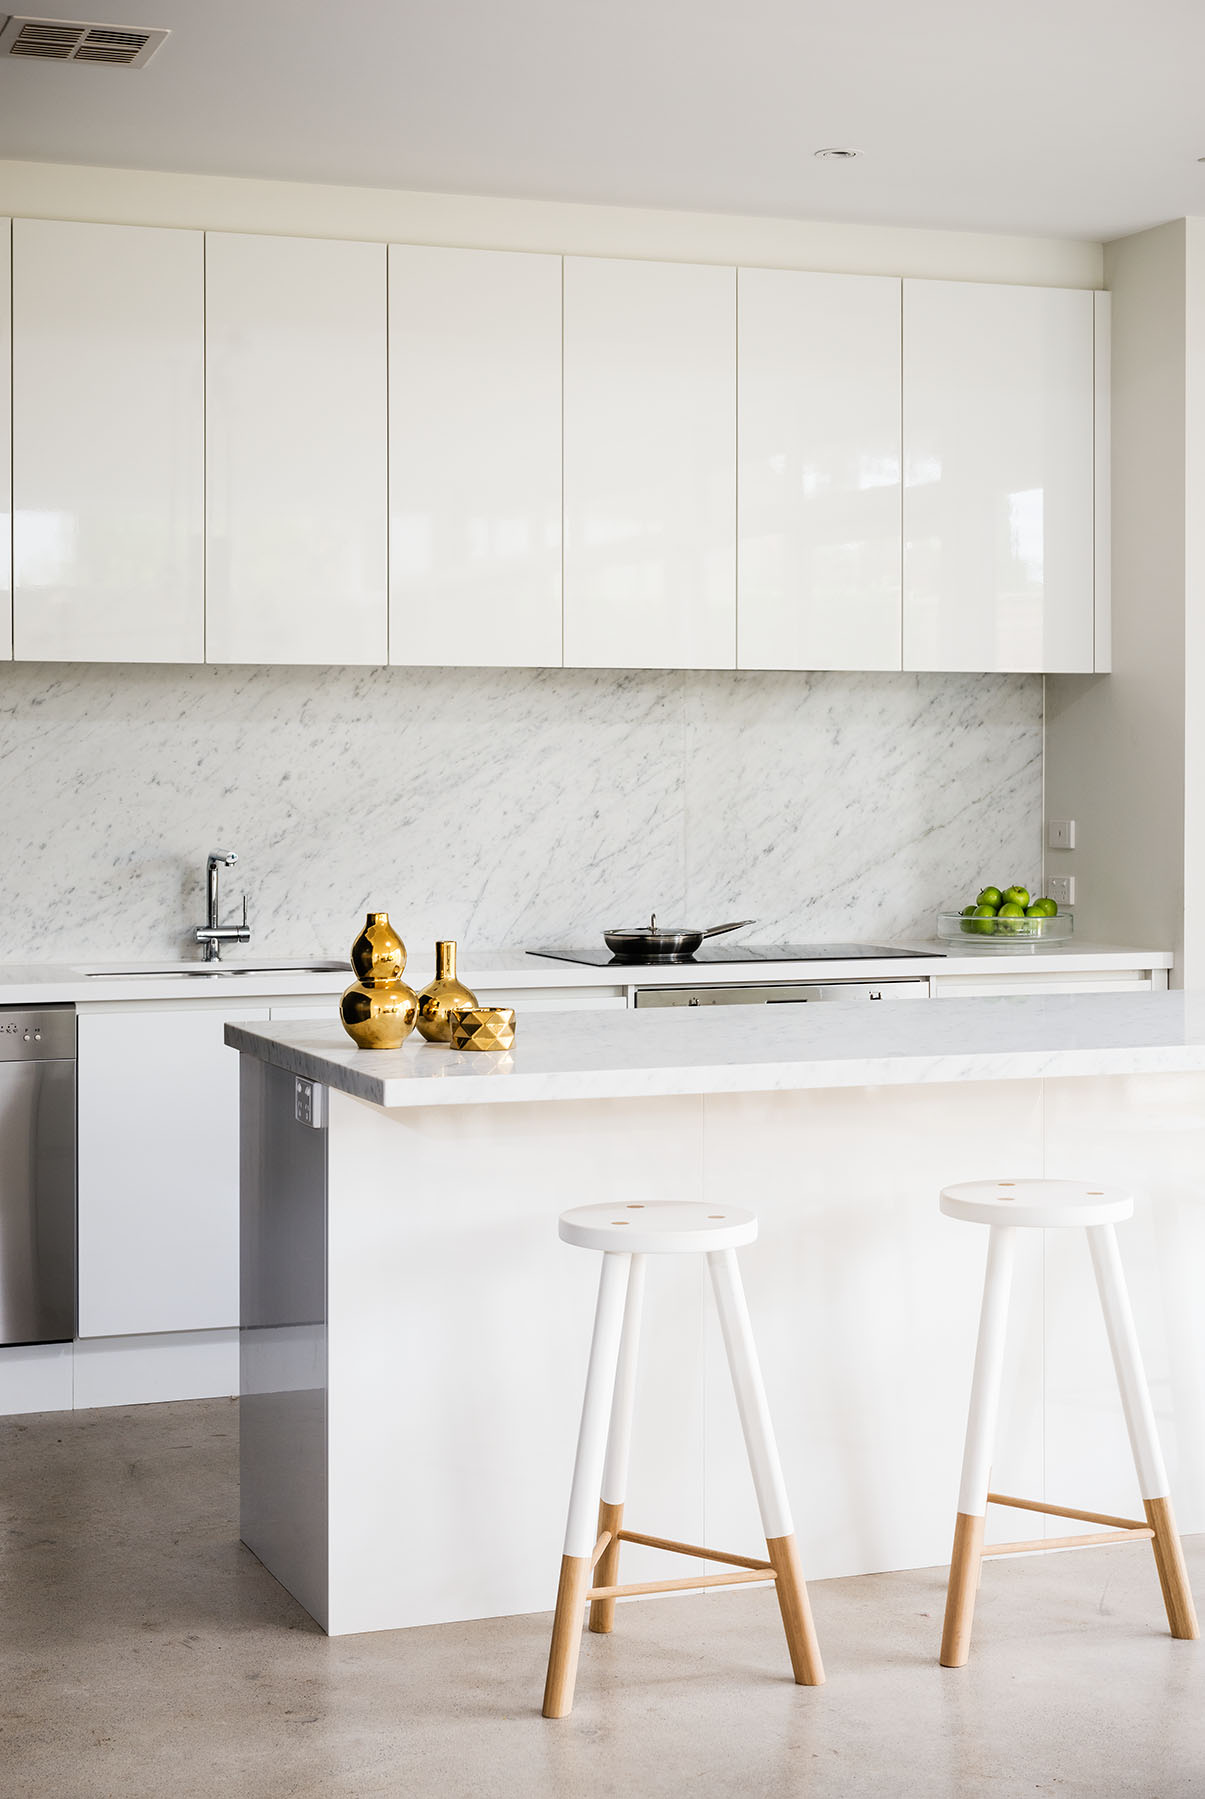 New House Range Hood And Minimalist Kitchen Design Classy Glam Living